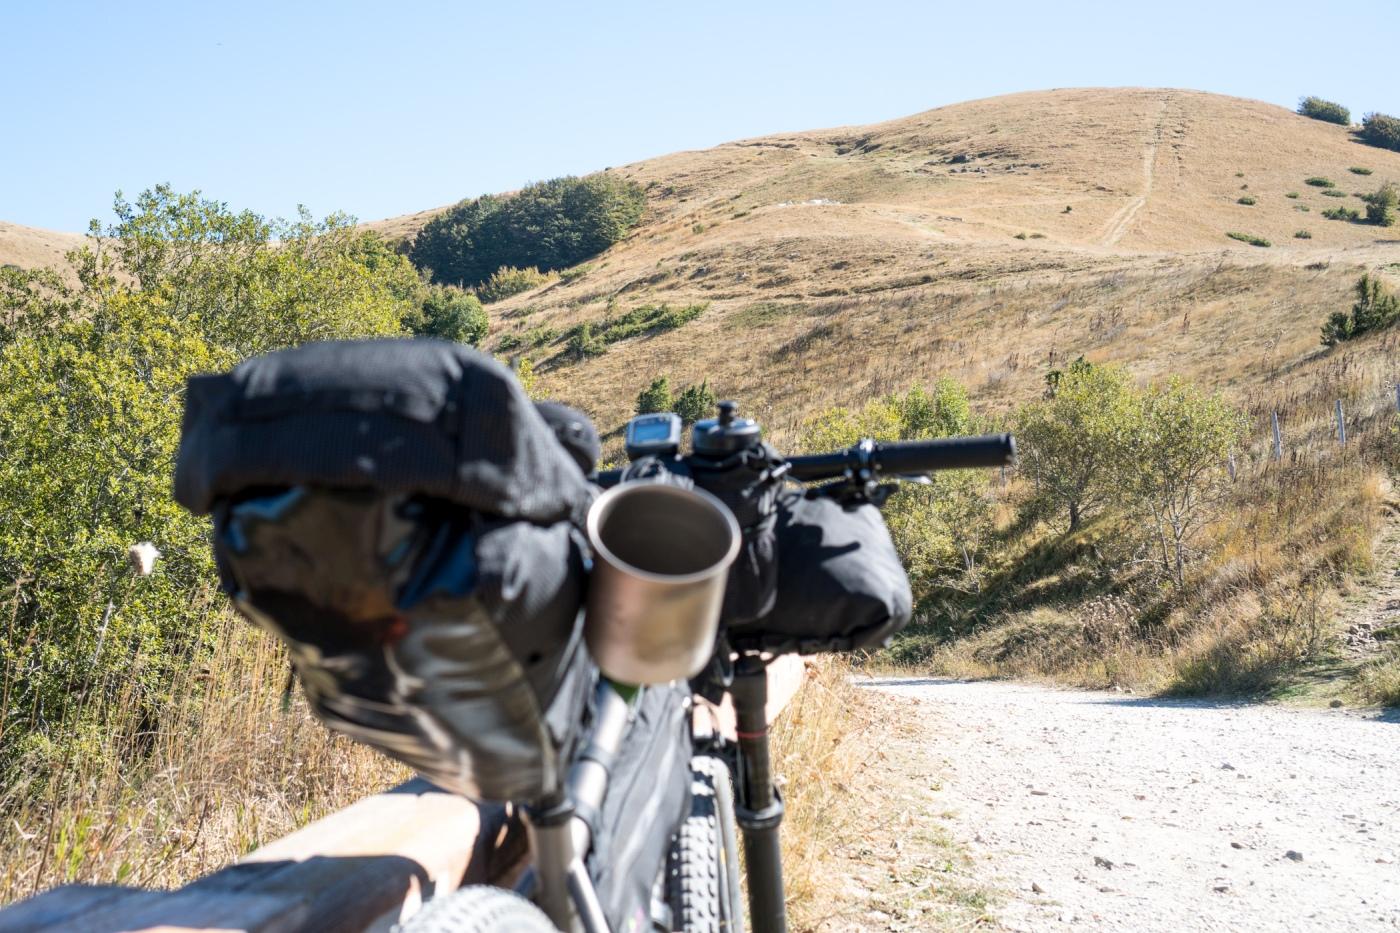 pratomagno_bikepacking-42